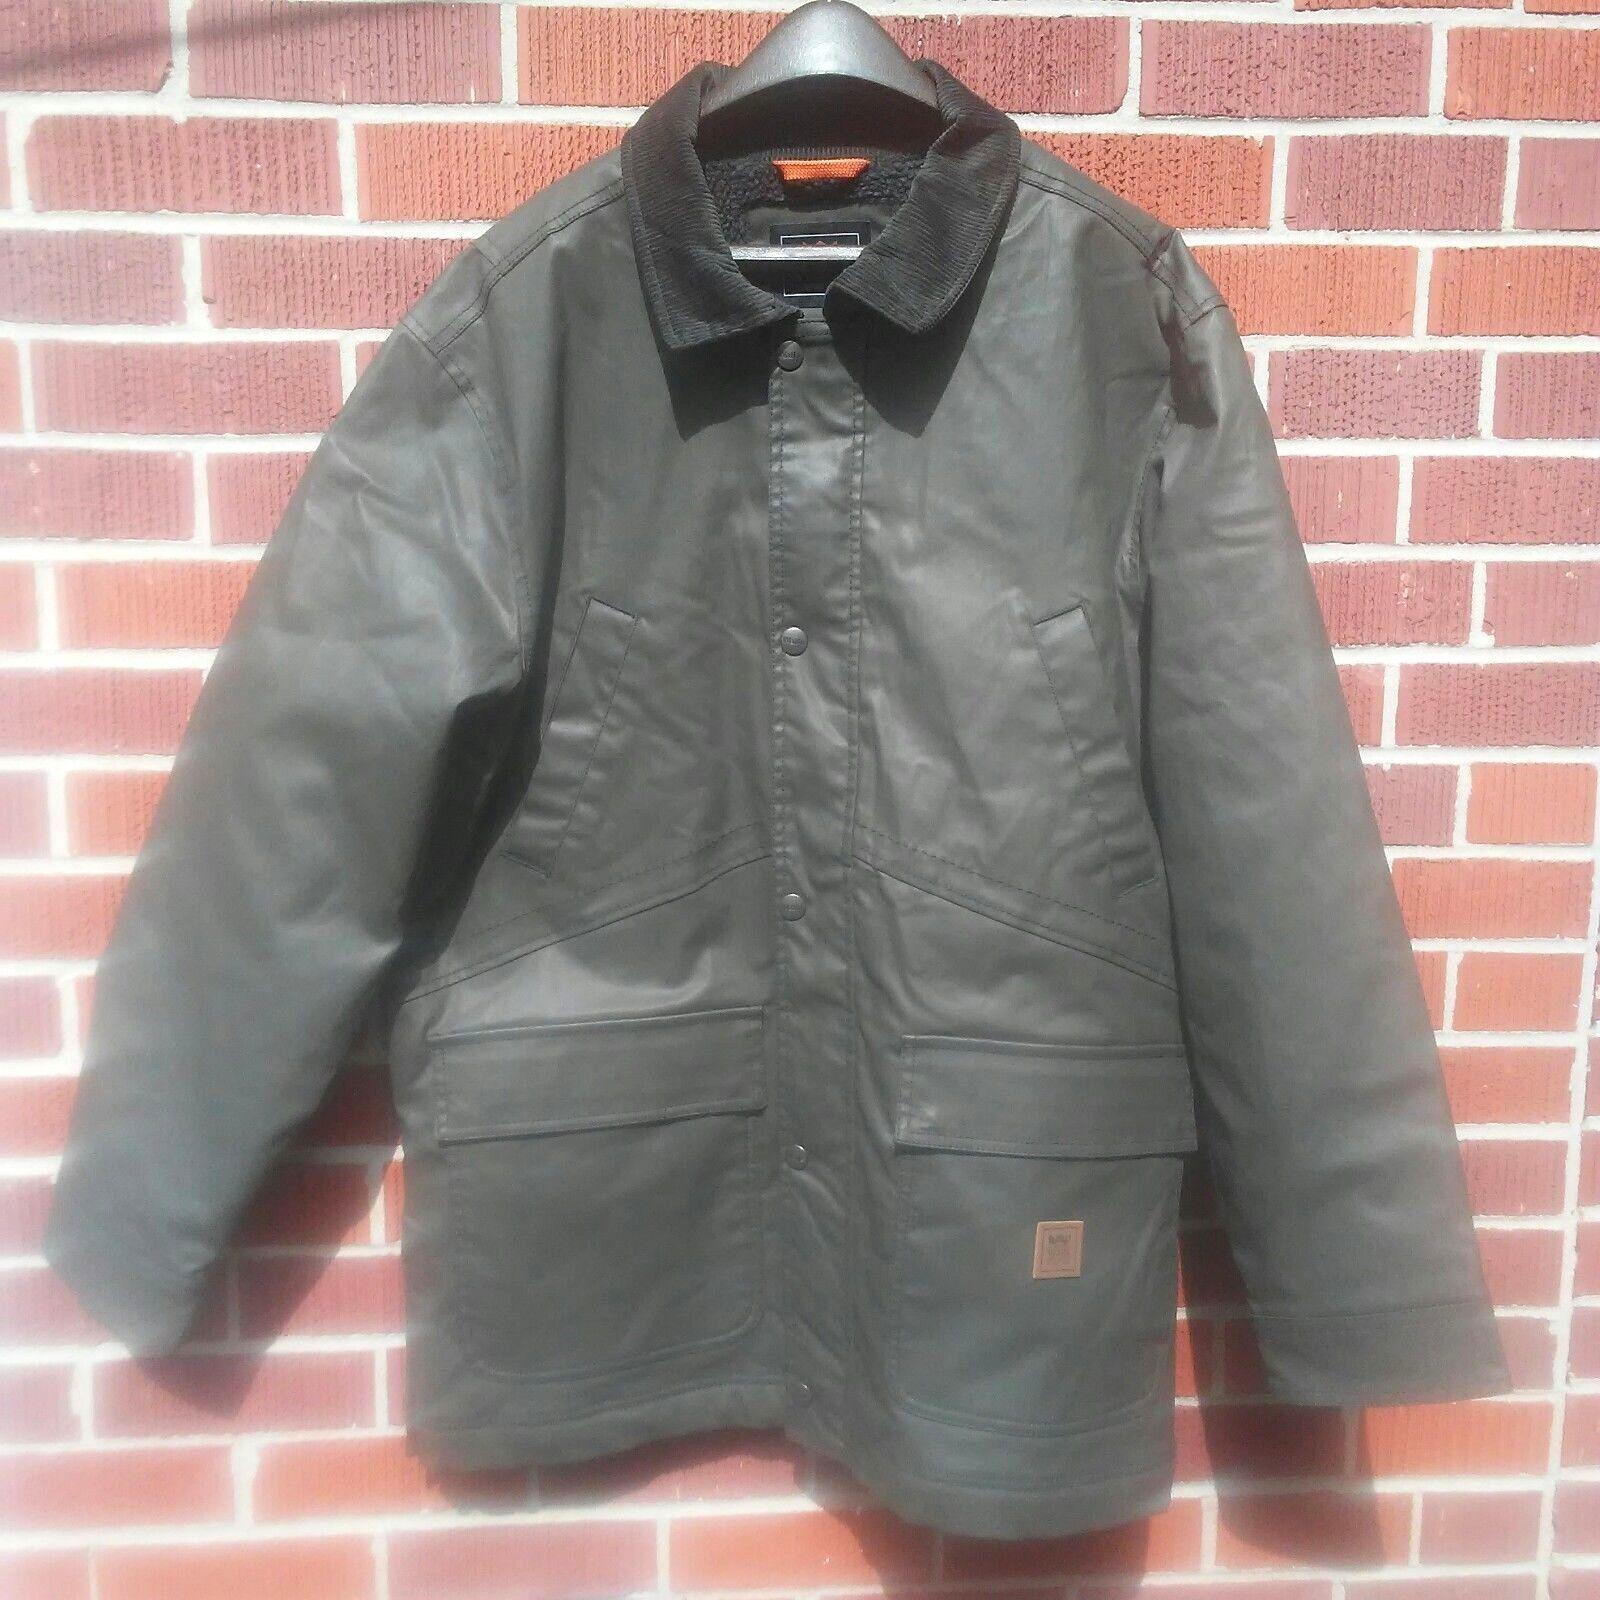 Walls Outdoor Goods Thinsulate Men's L G G Olive Green Coat (Measures XXL)